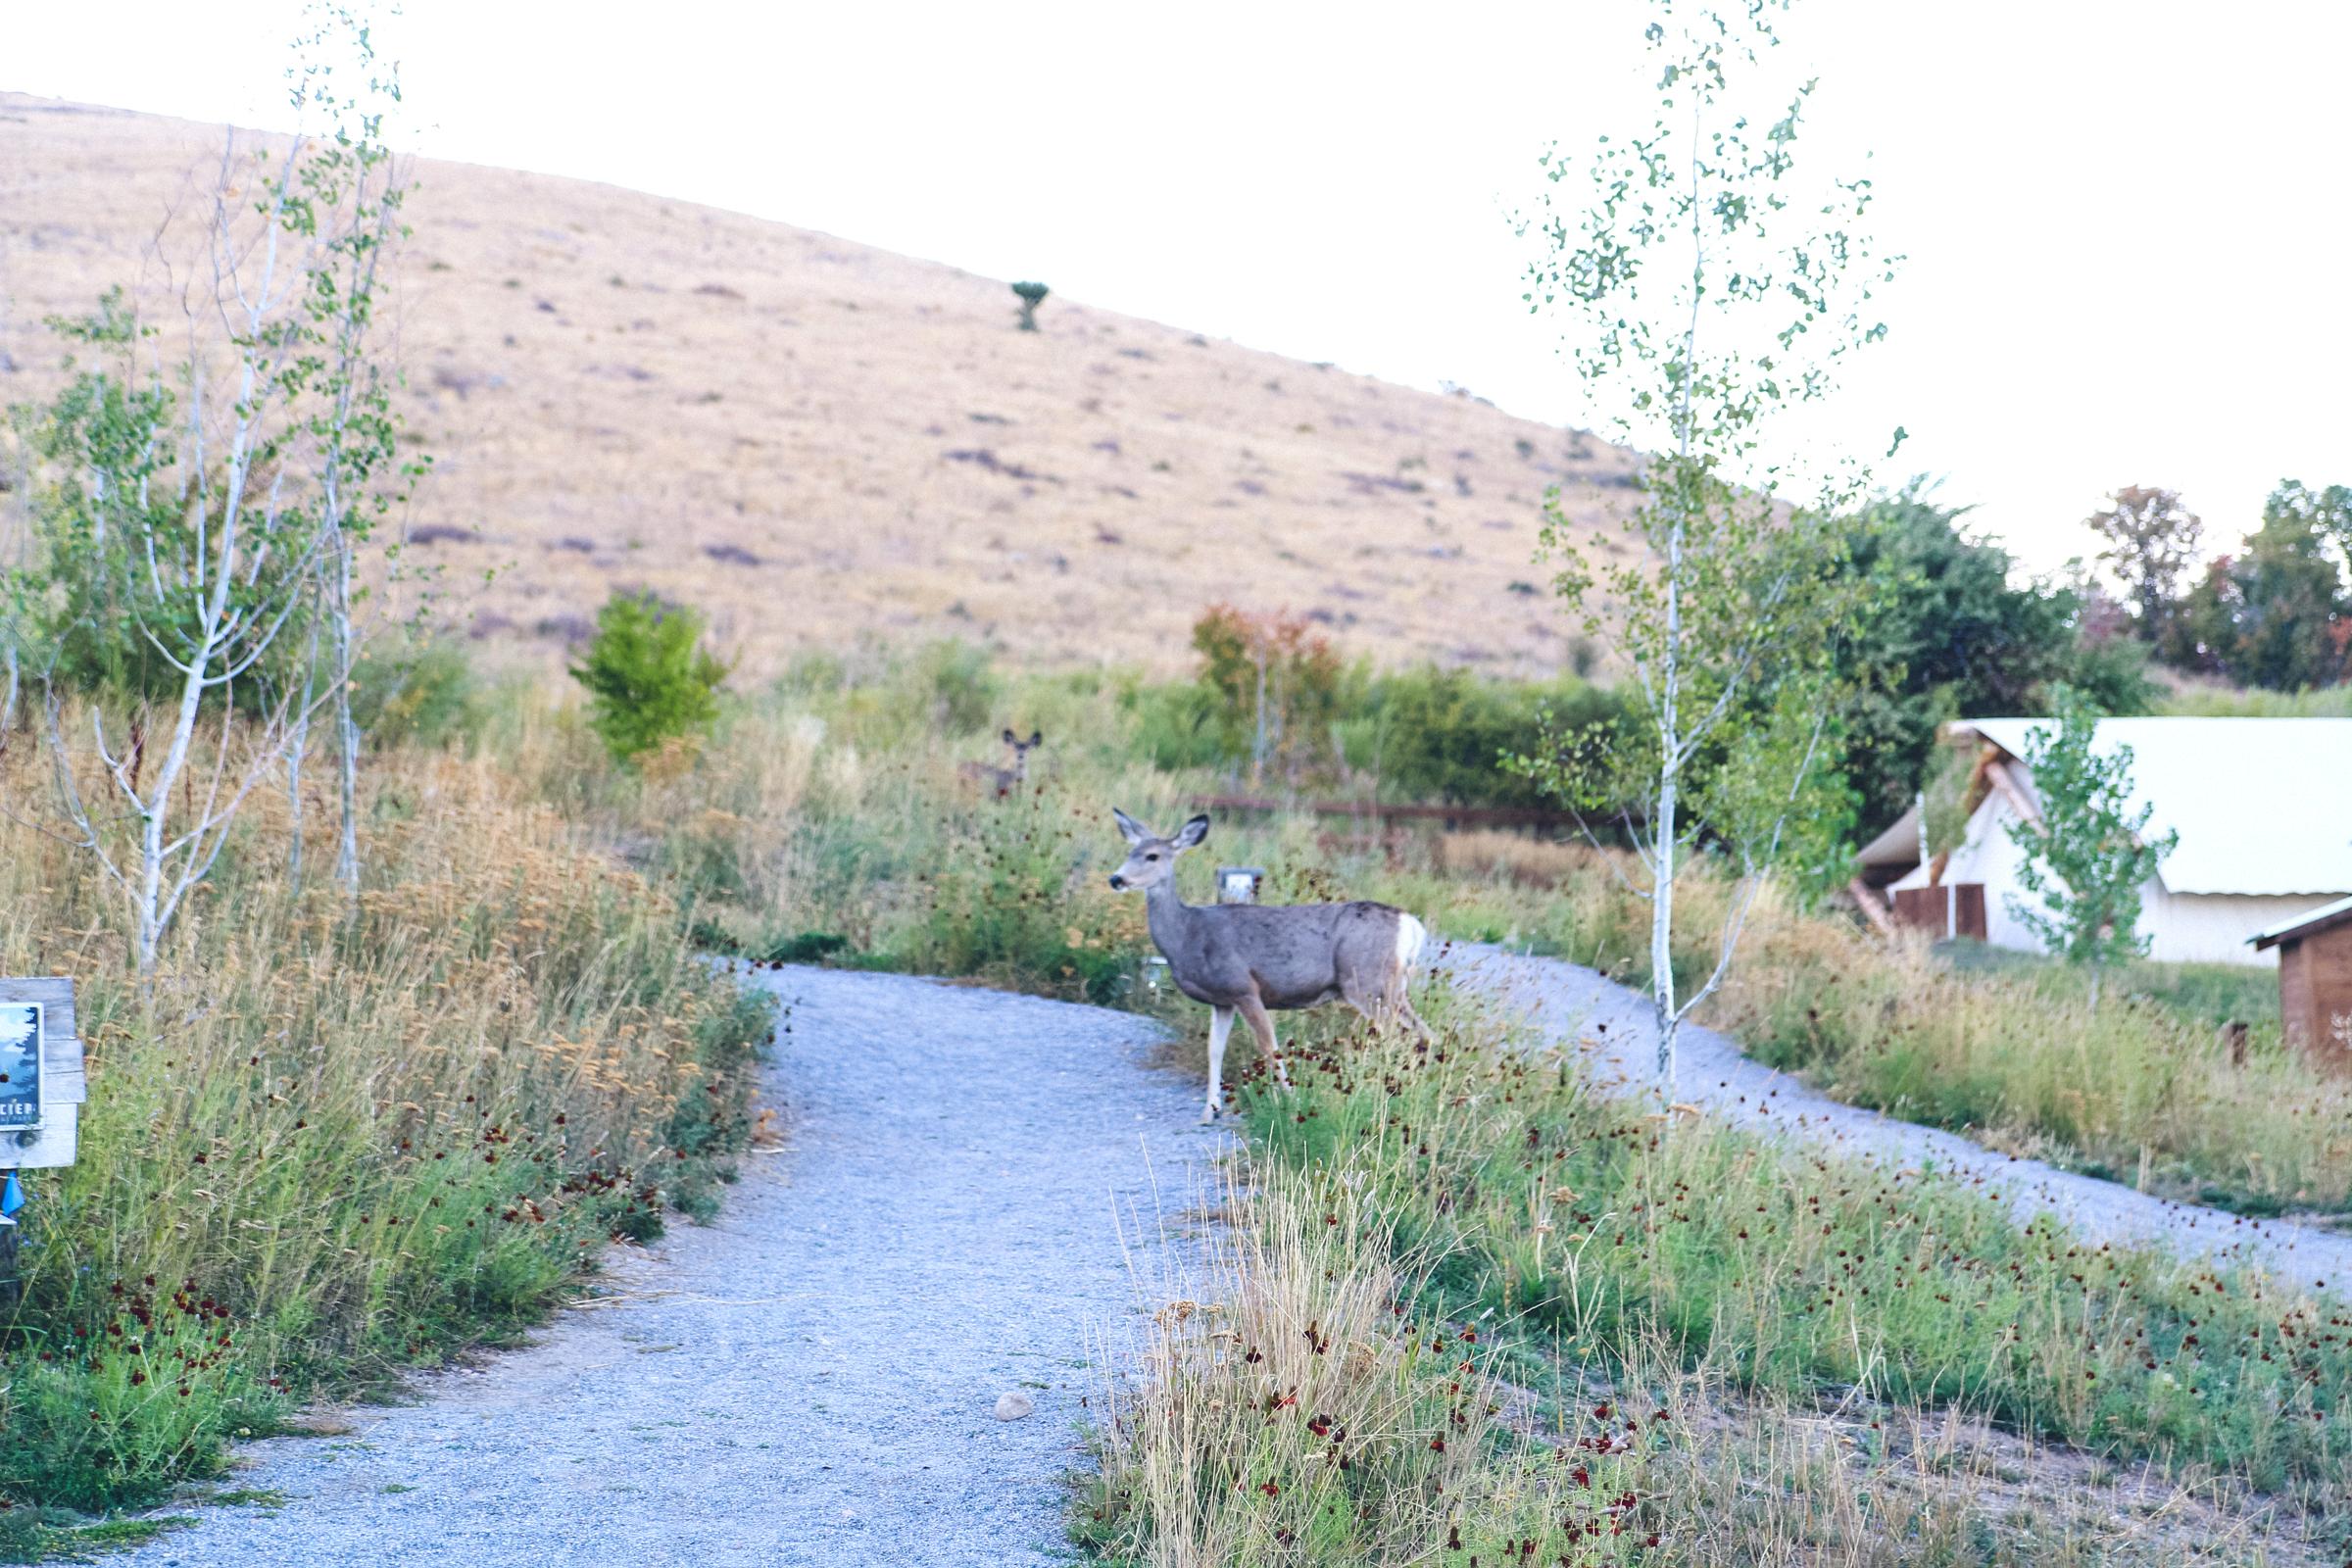 Deer at Conestoga Ranch